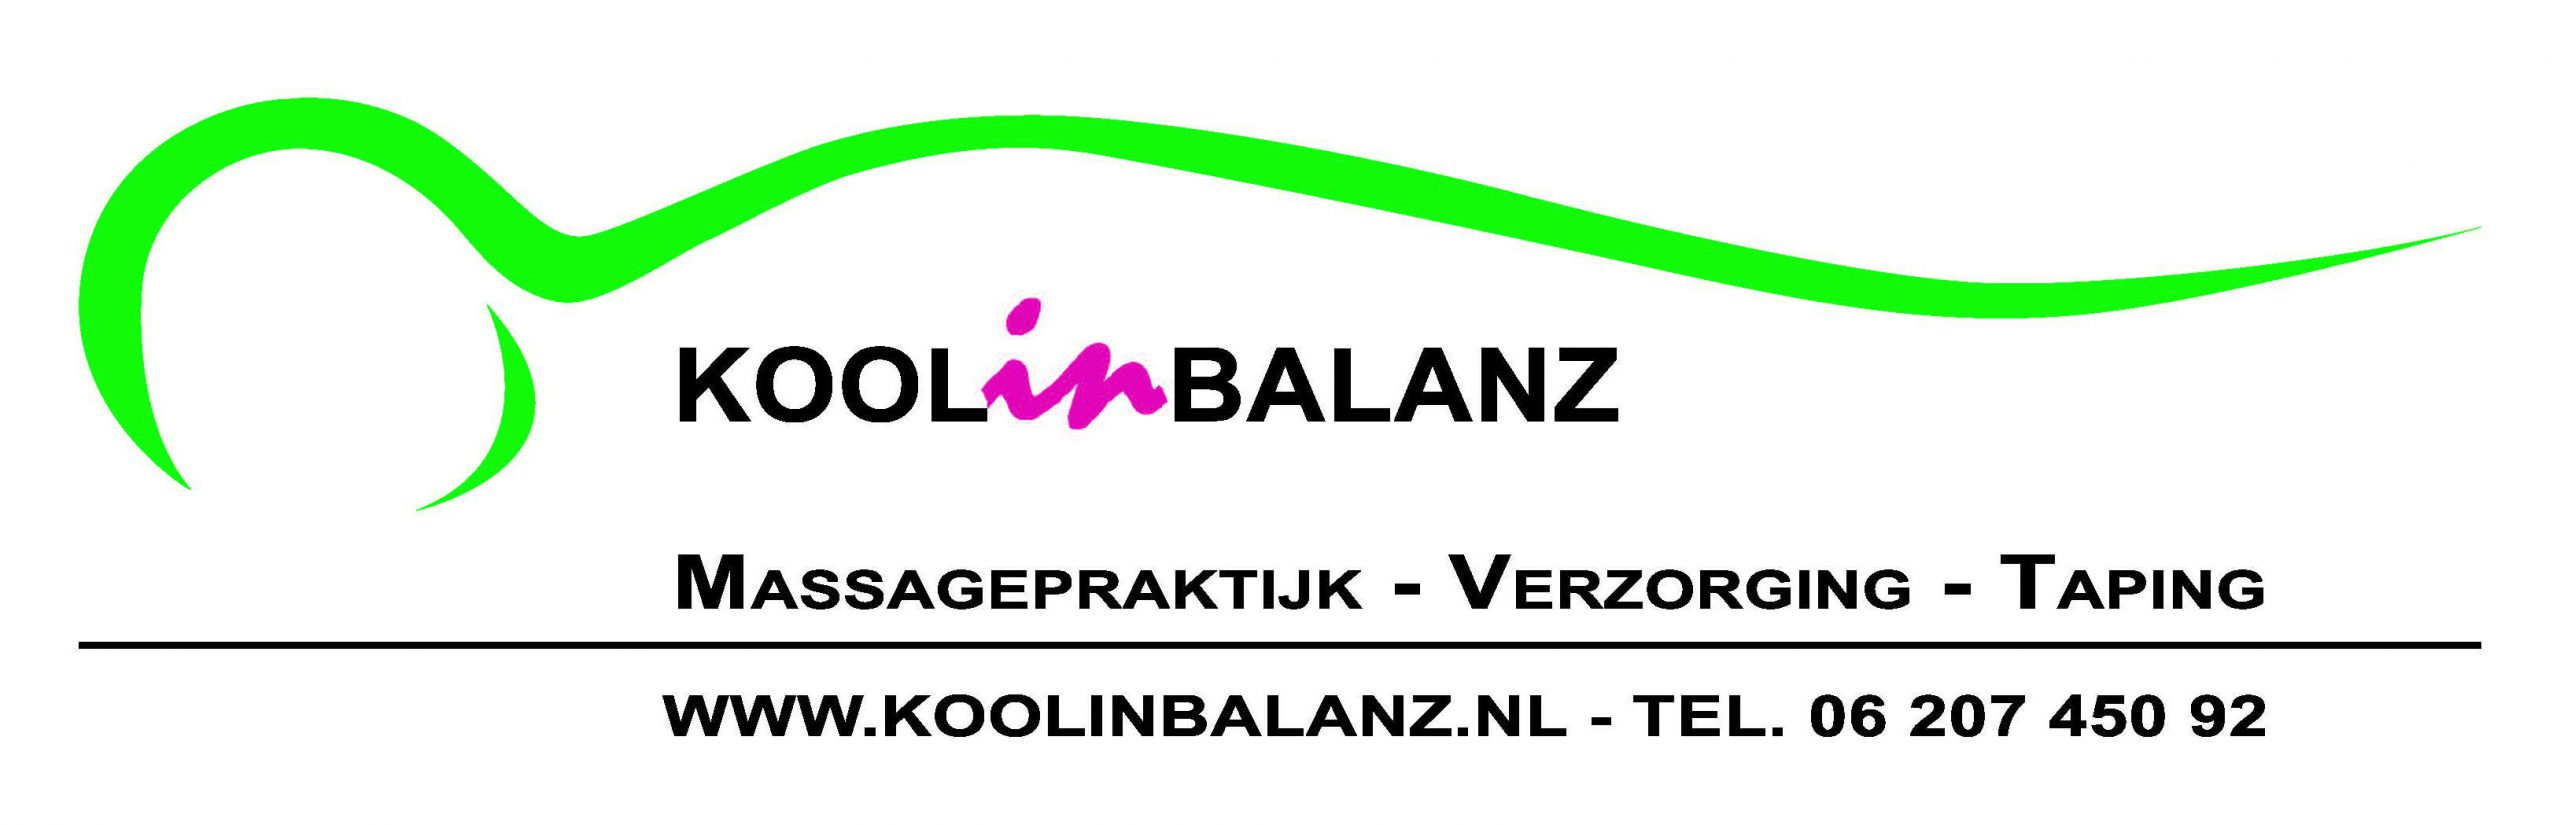 koolinbalanz.nl